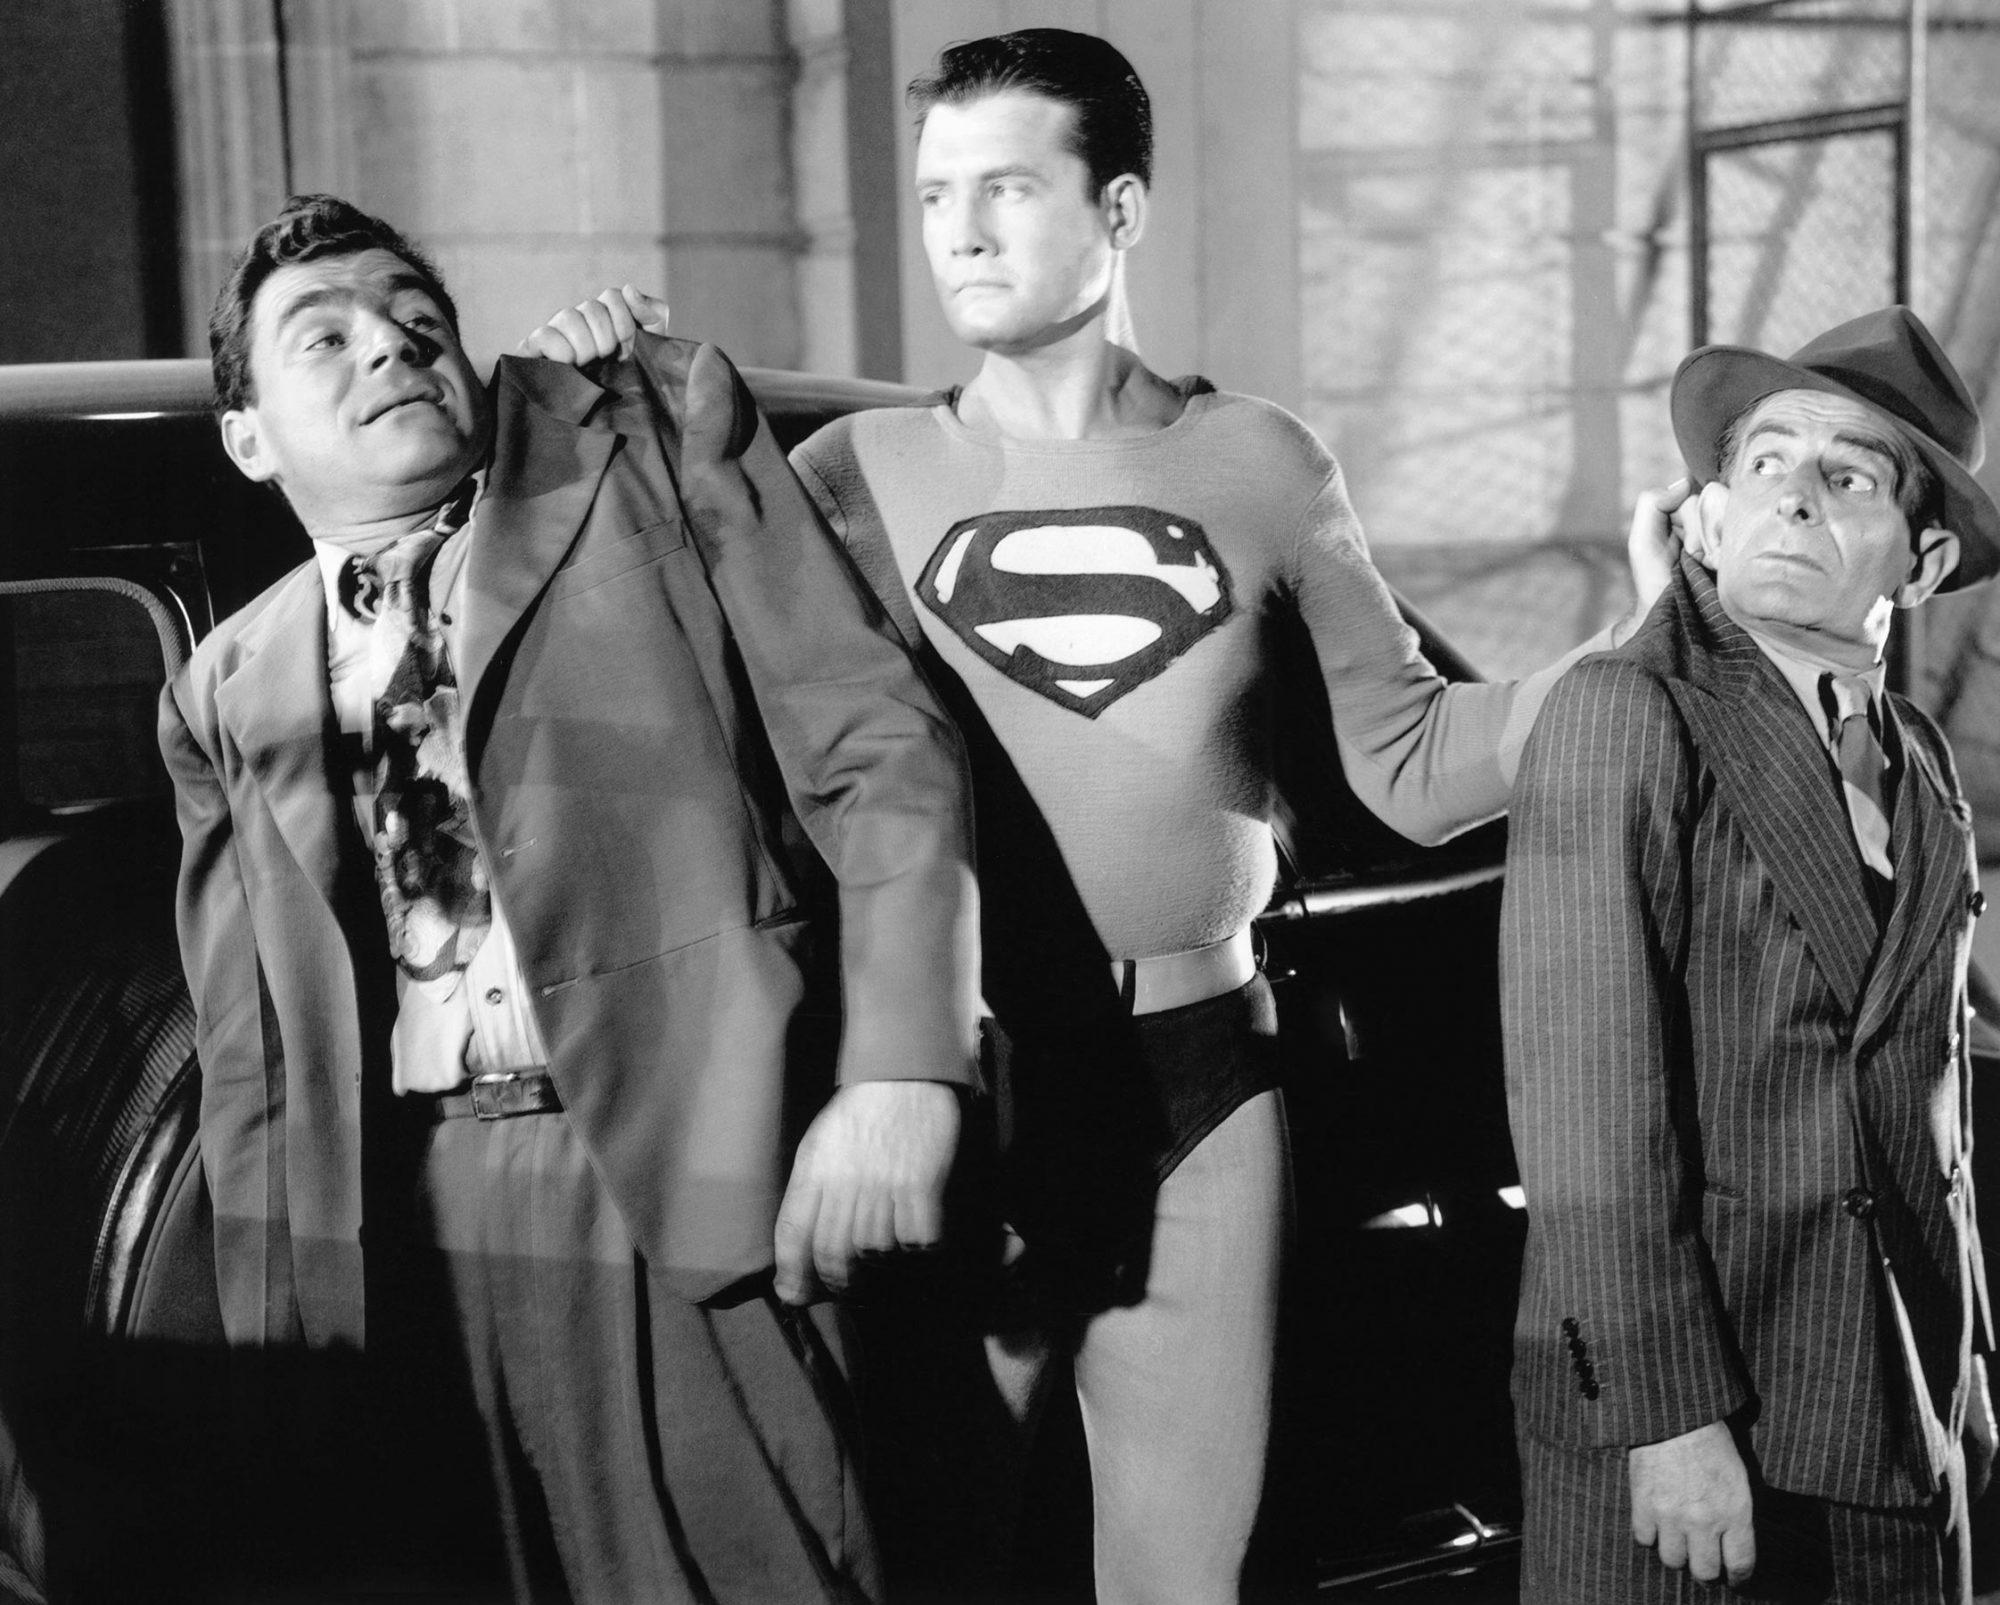 ADVENTURES OF SUPERMAN, George Reeves, (center), 1951-57